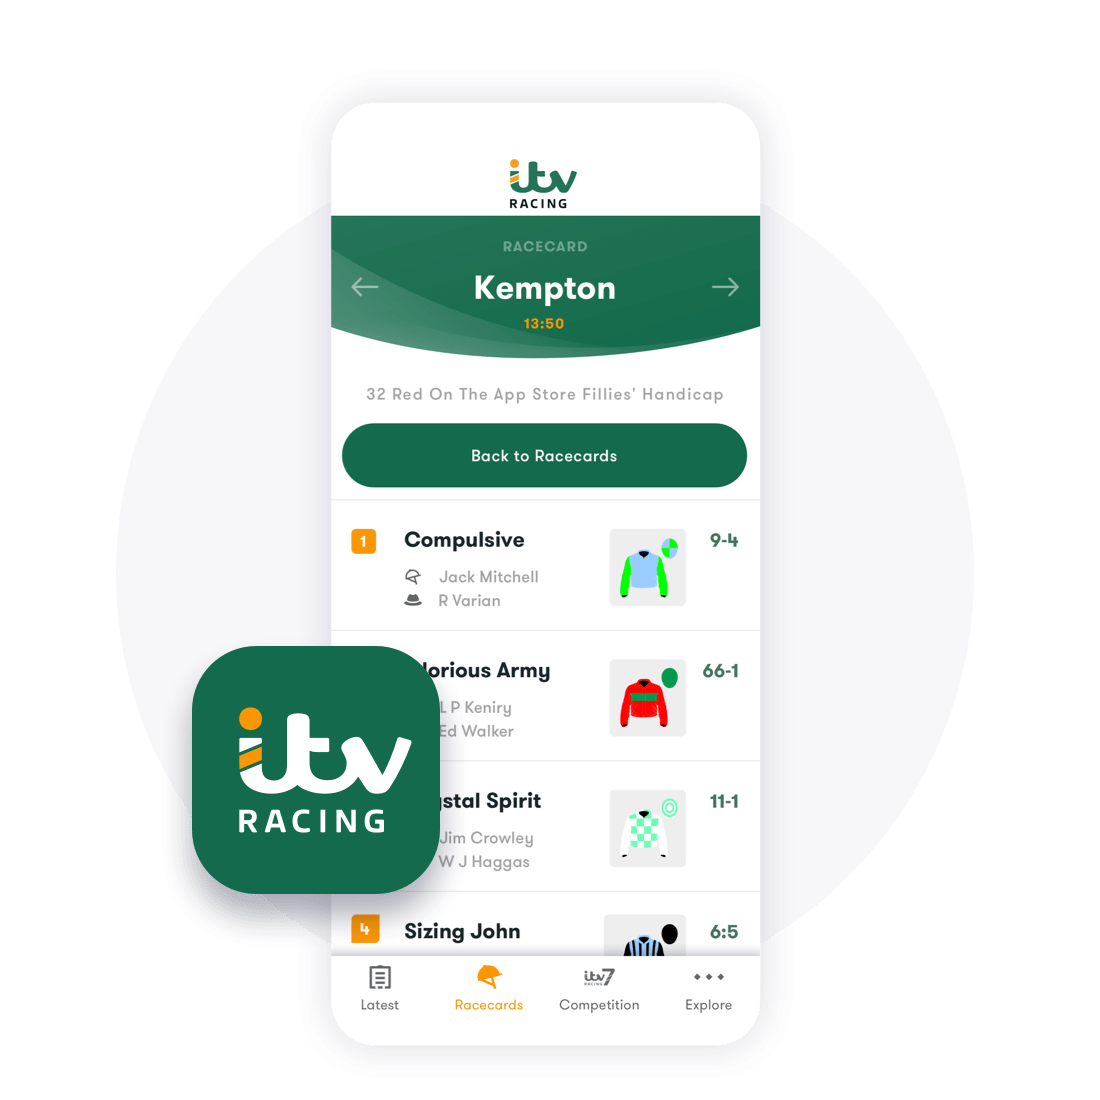 Racecard on ITV racing app